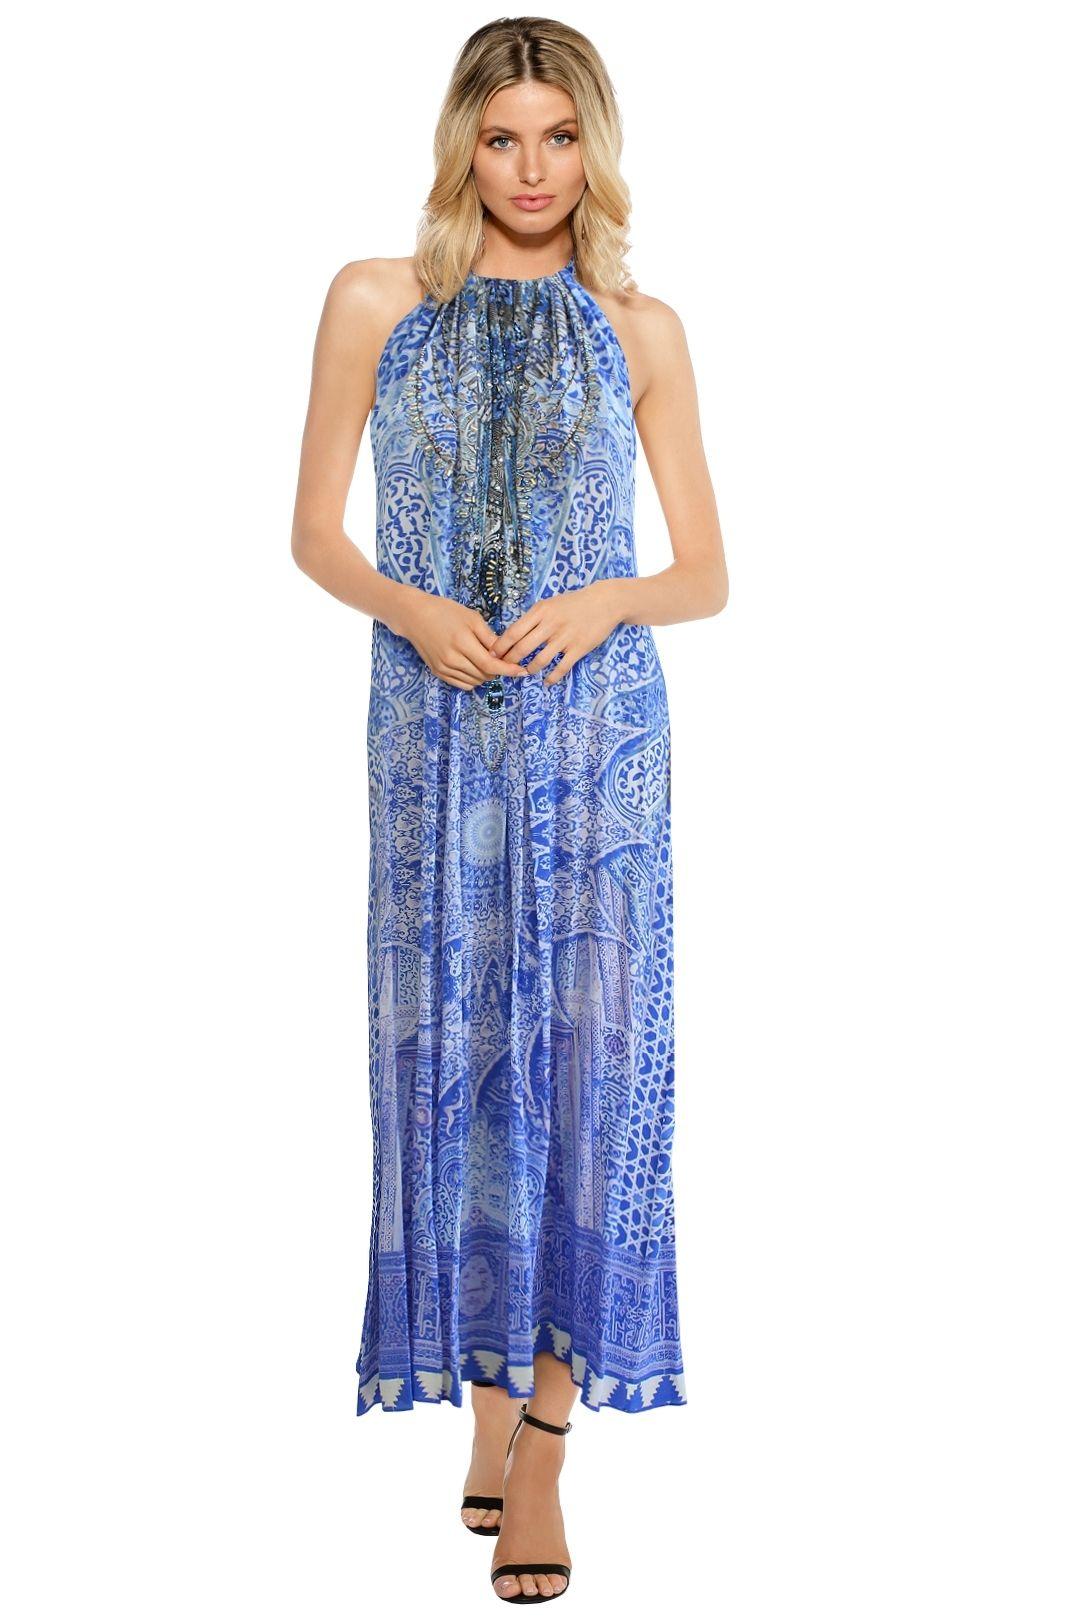 Camilla - Bosphorous Drawstring Dress - Prints - Front